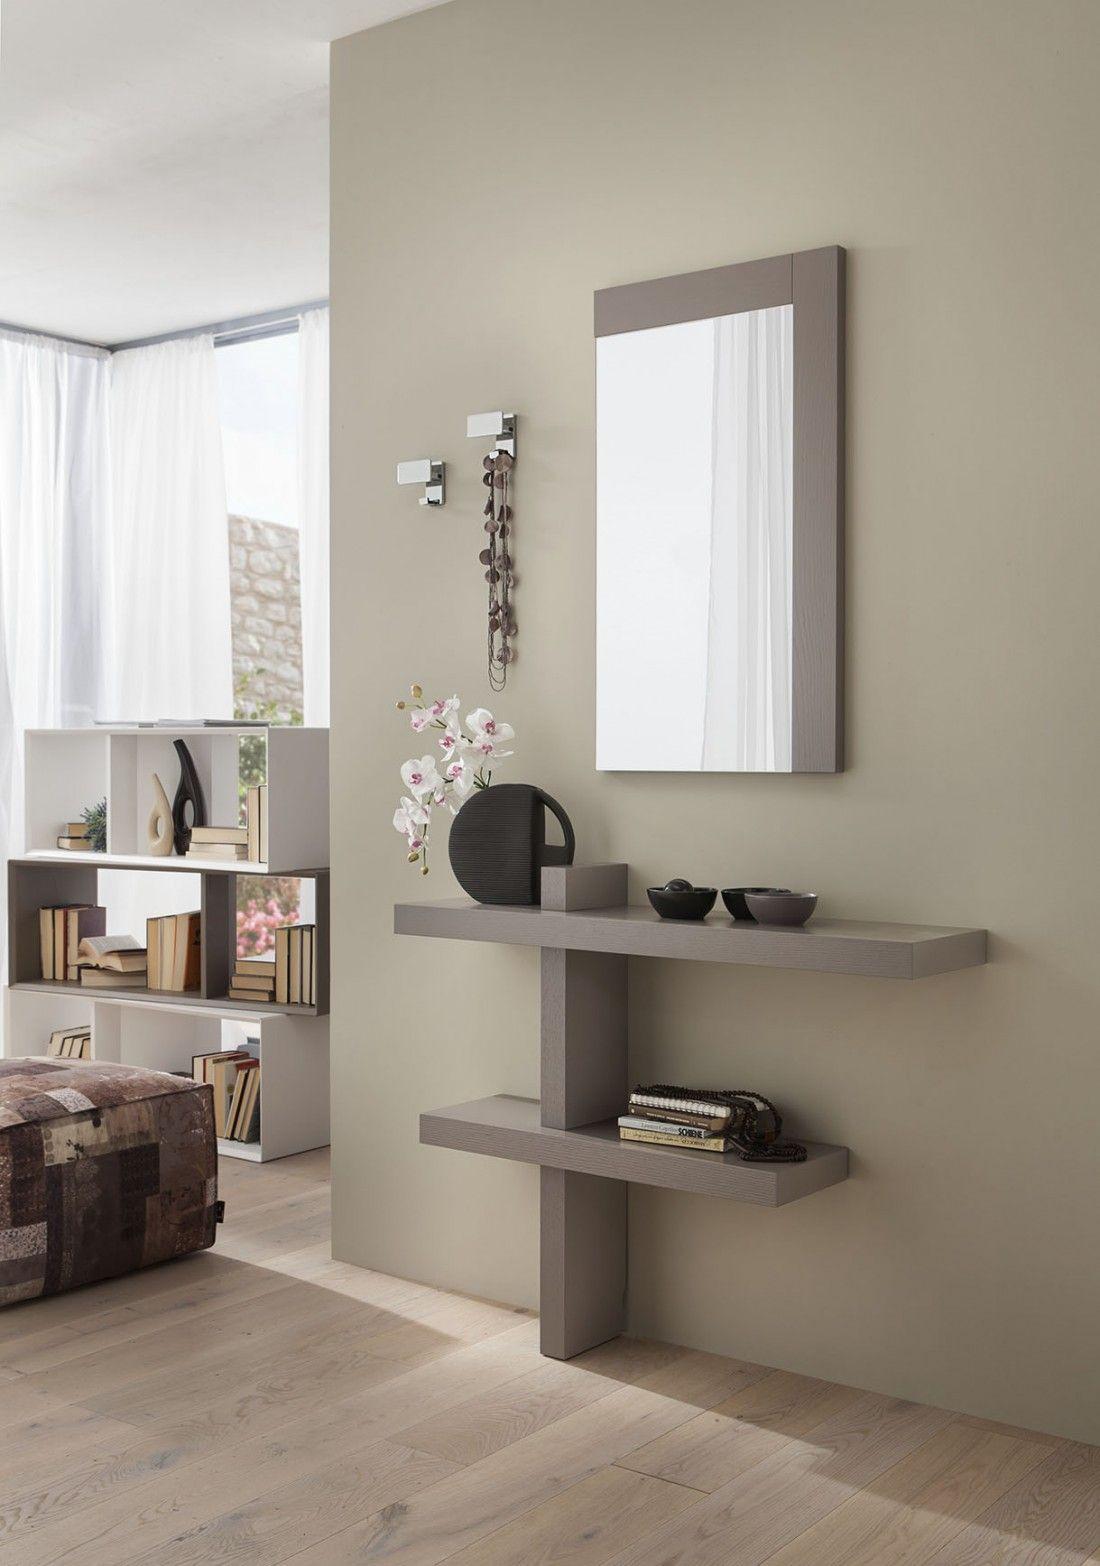 Decorating ideas for living room walls composizione ingresso design frassino tortora  dressing tables